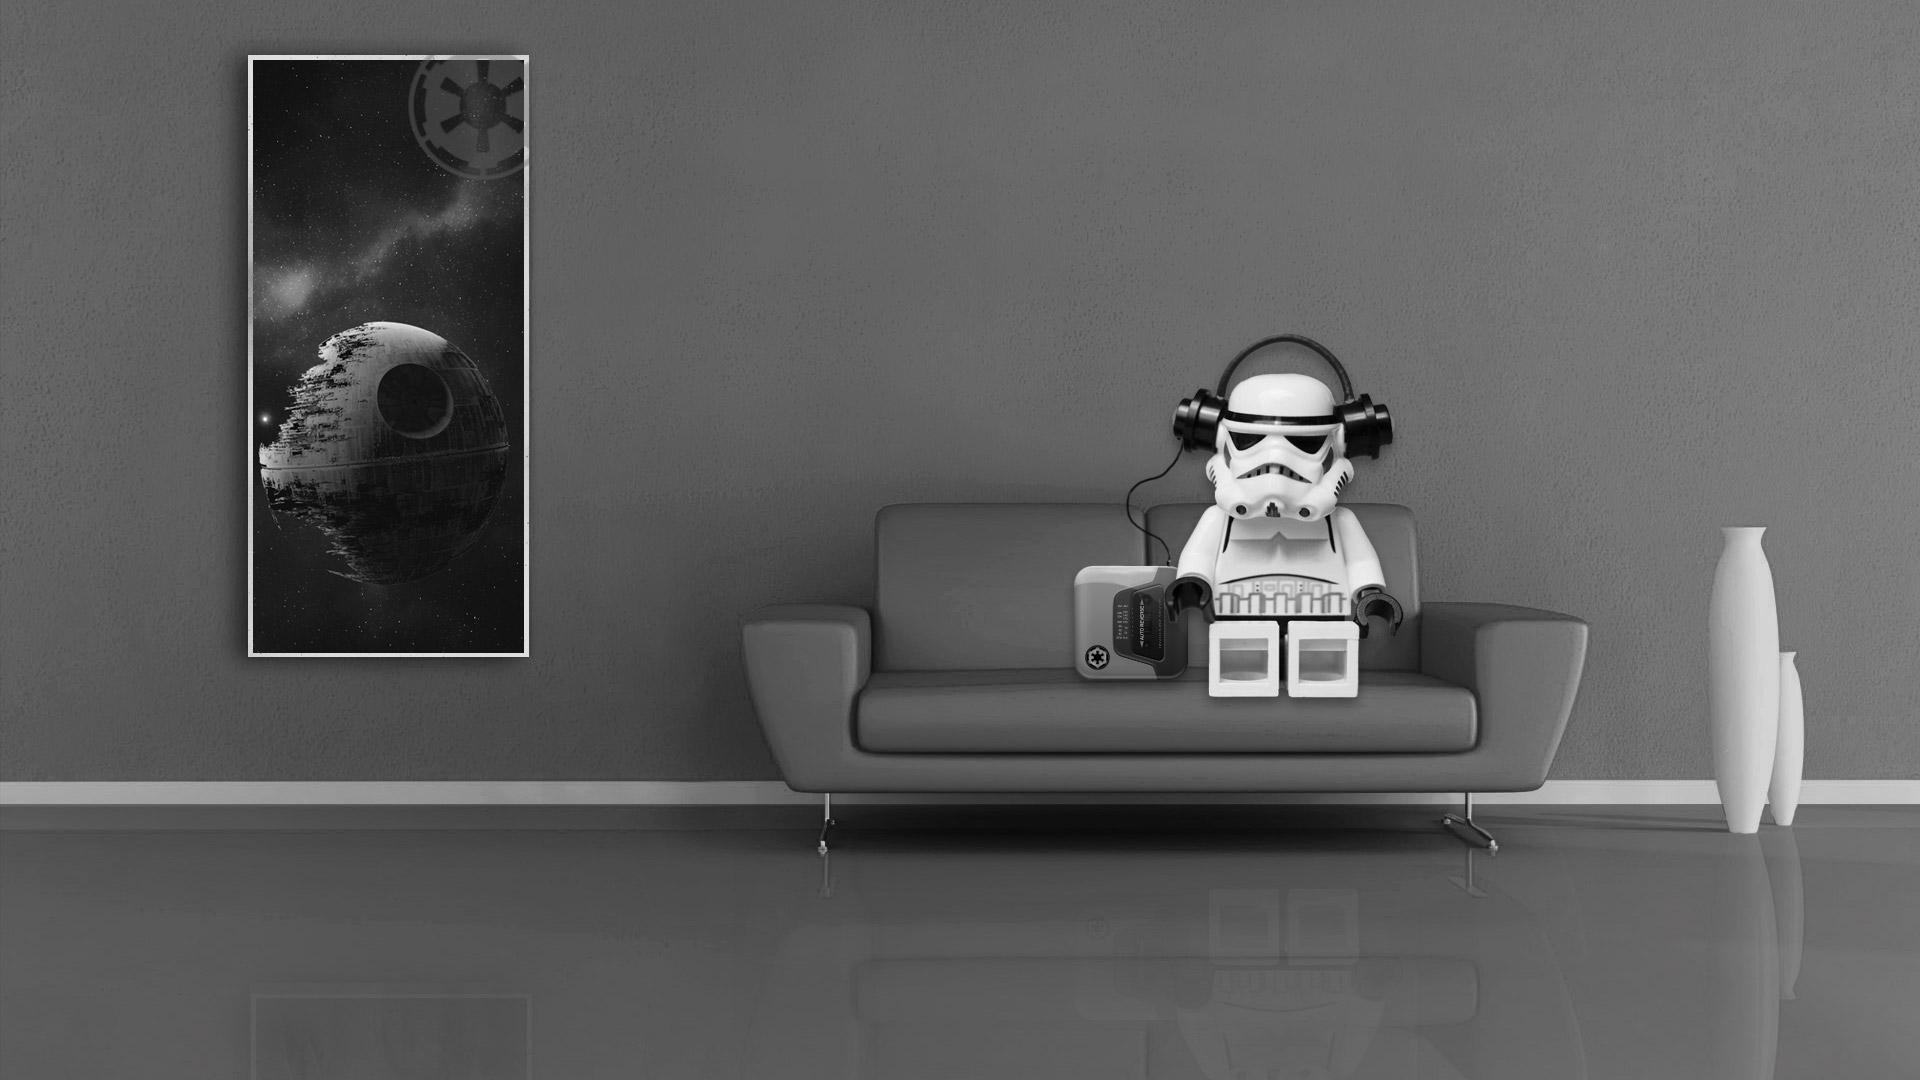 Stormtrooper Lego Star Wars Hd Artist 4k Wallpapers